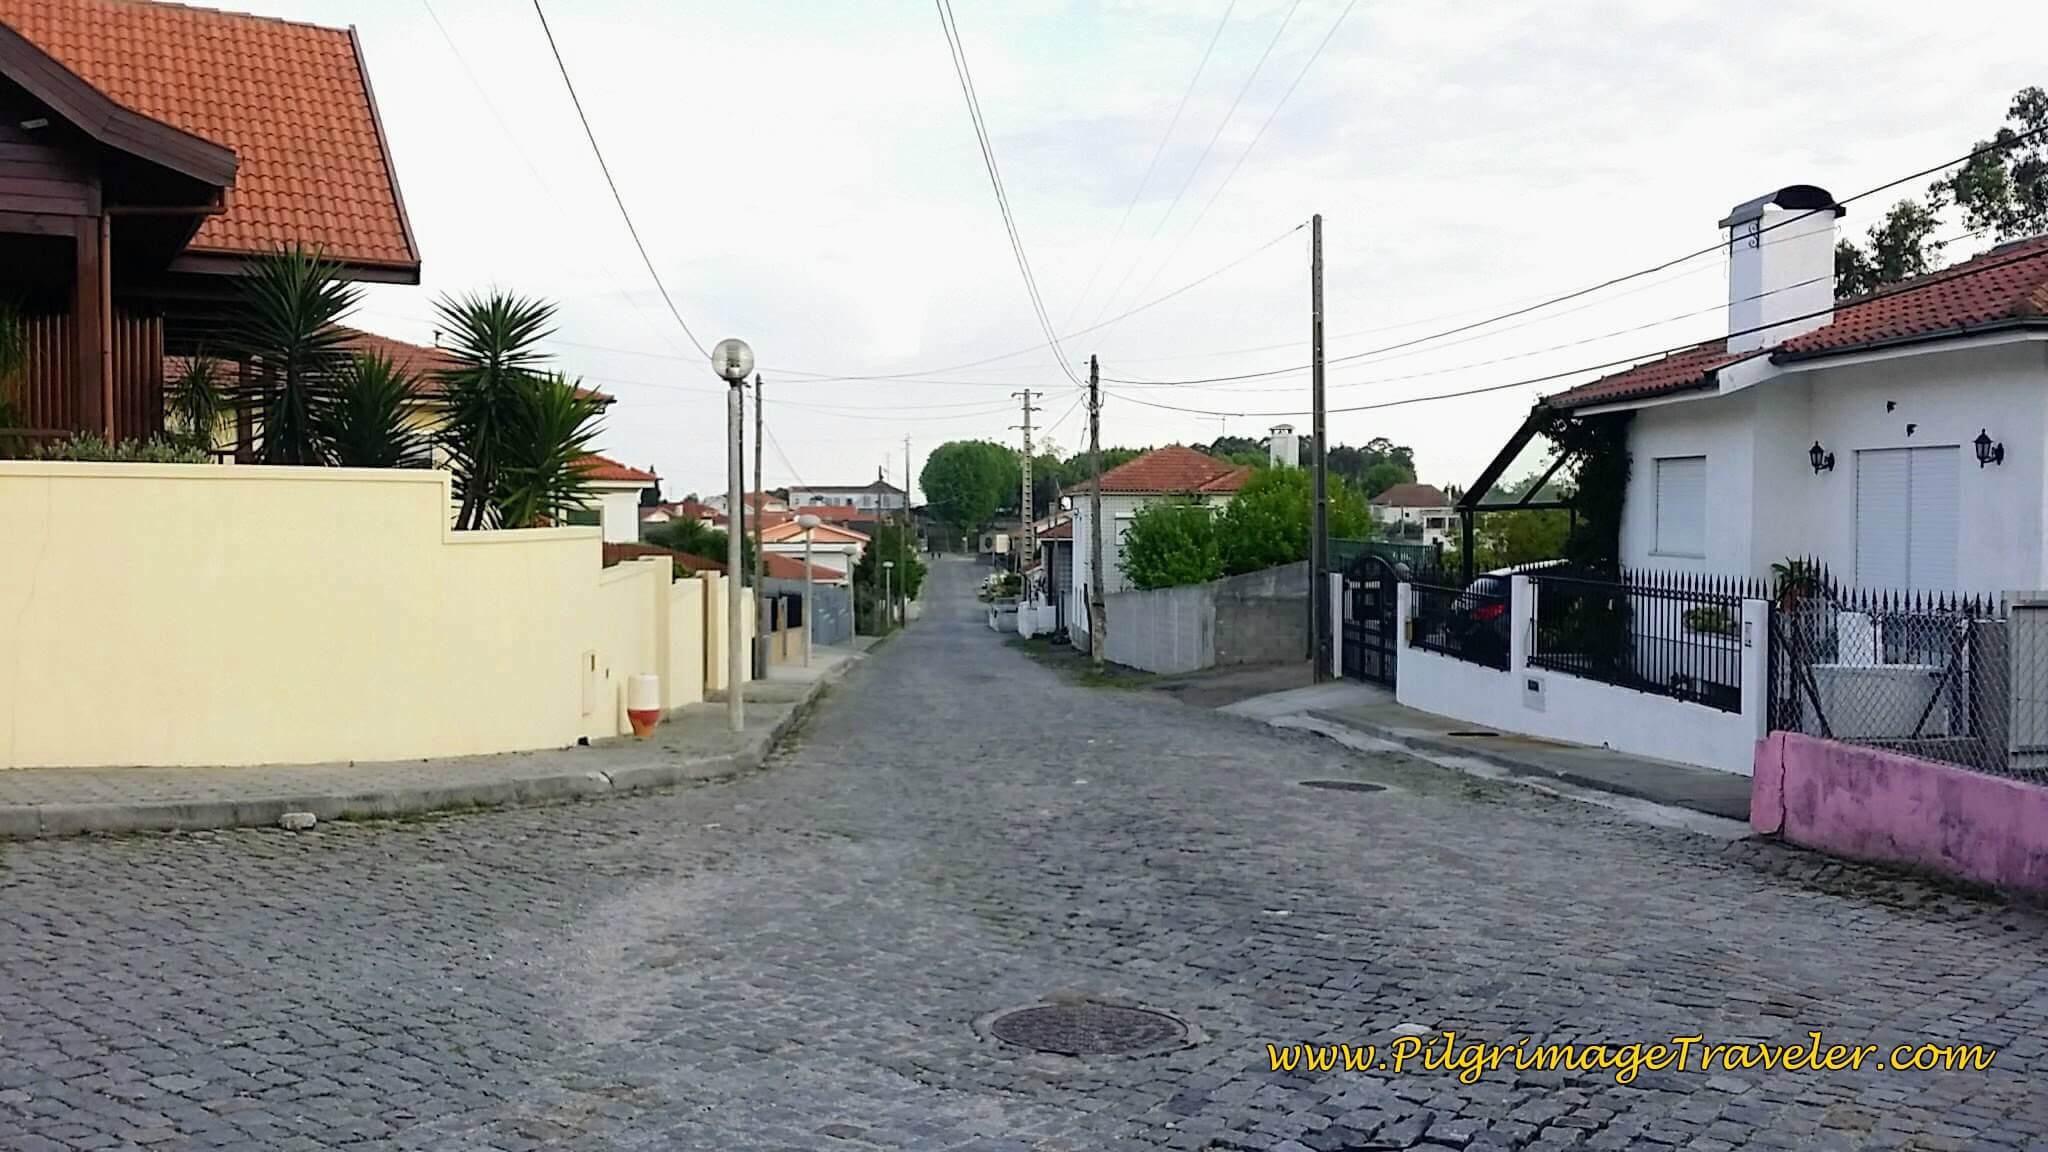 Quiet Rua Estrada Romana on Day Fourteen of the Portuguese Way